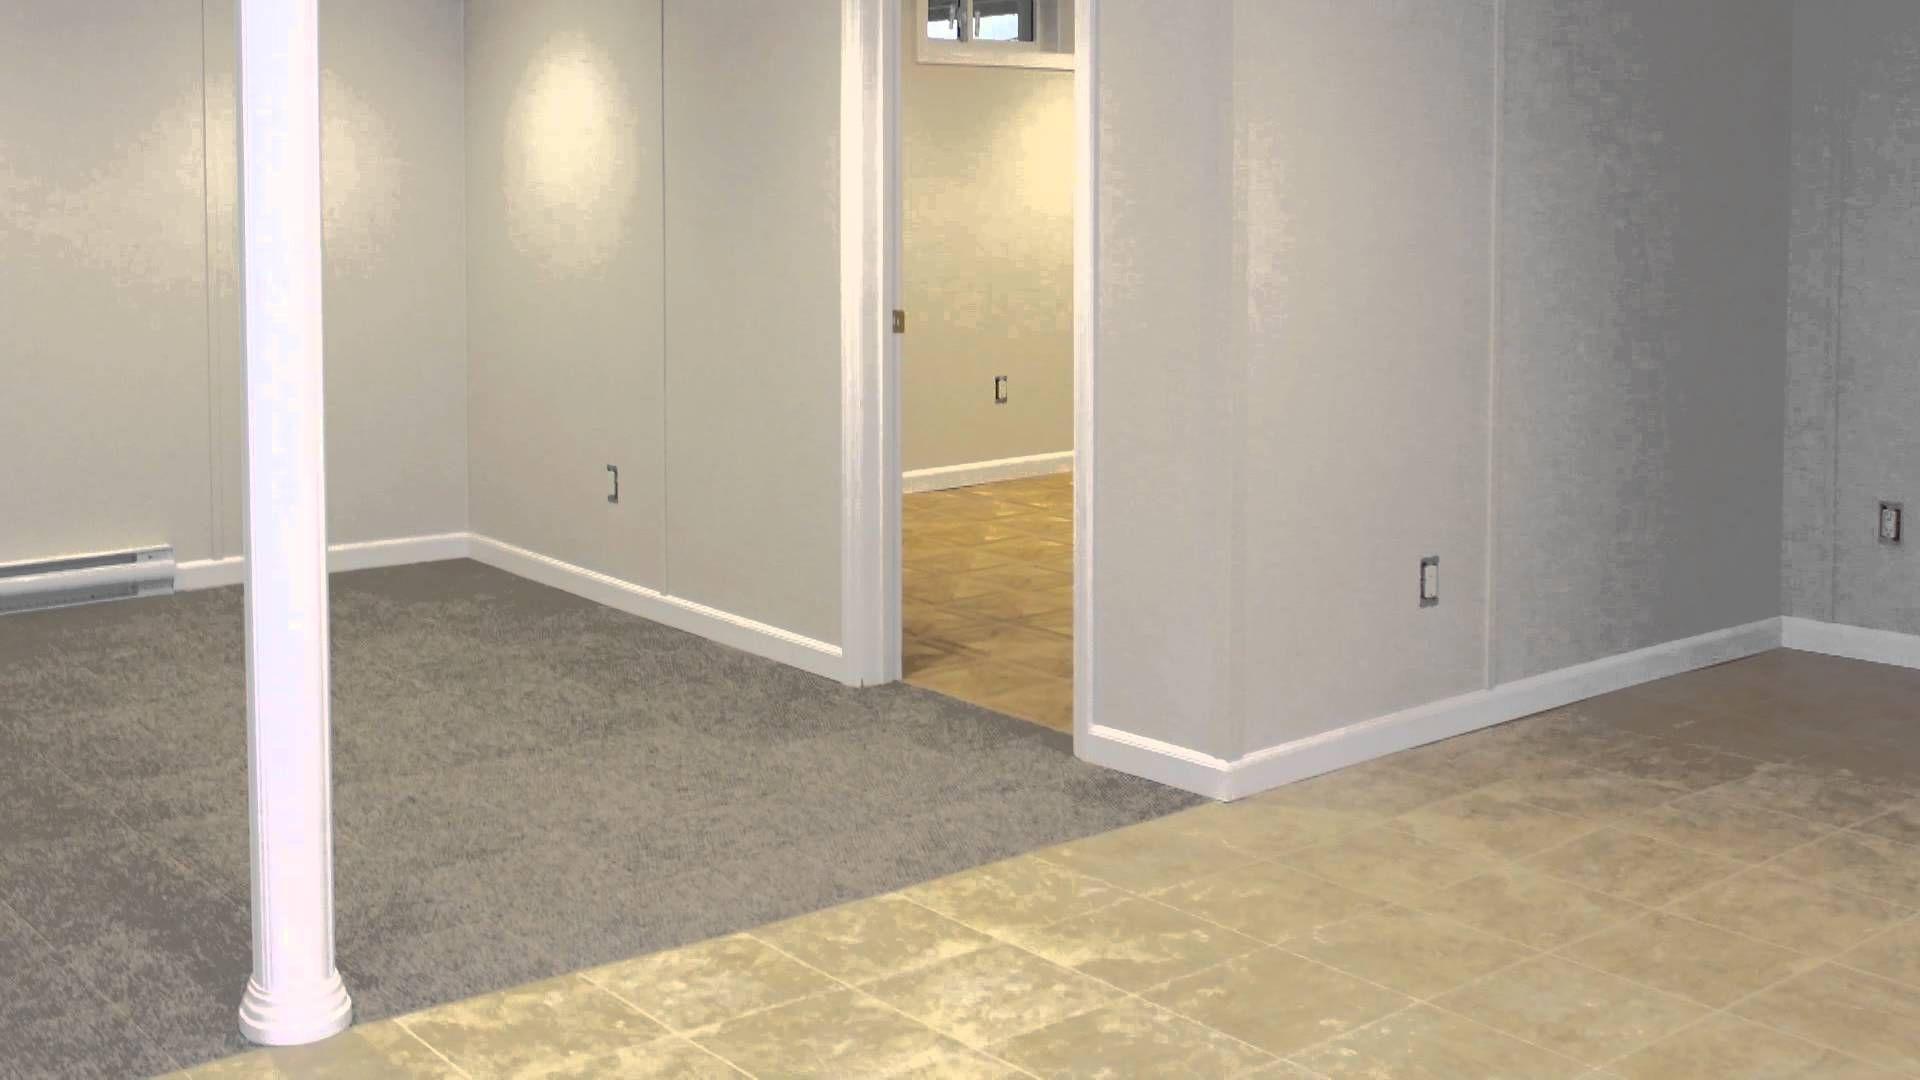 Basement: Waterproof Basement Wall Panels Used Brick Wall Basement With Wooden  Basement Poles And Small